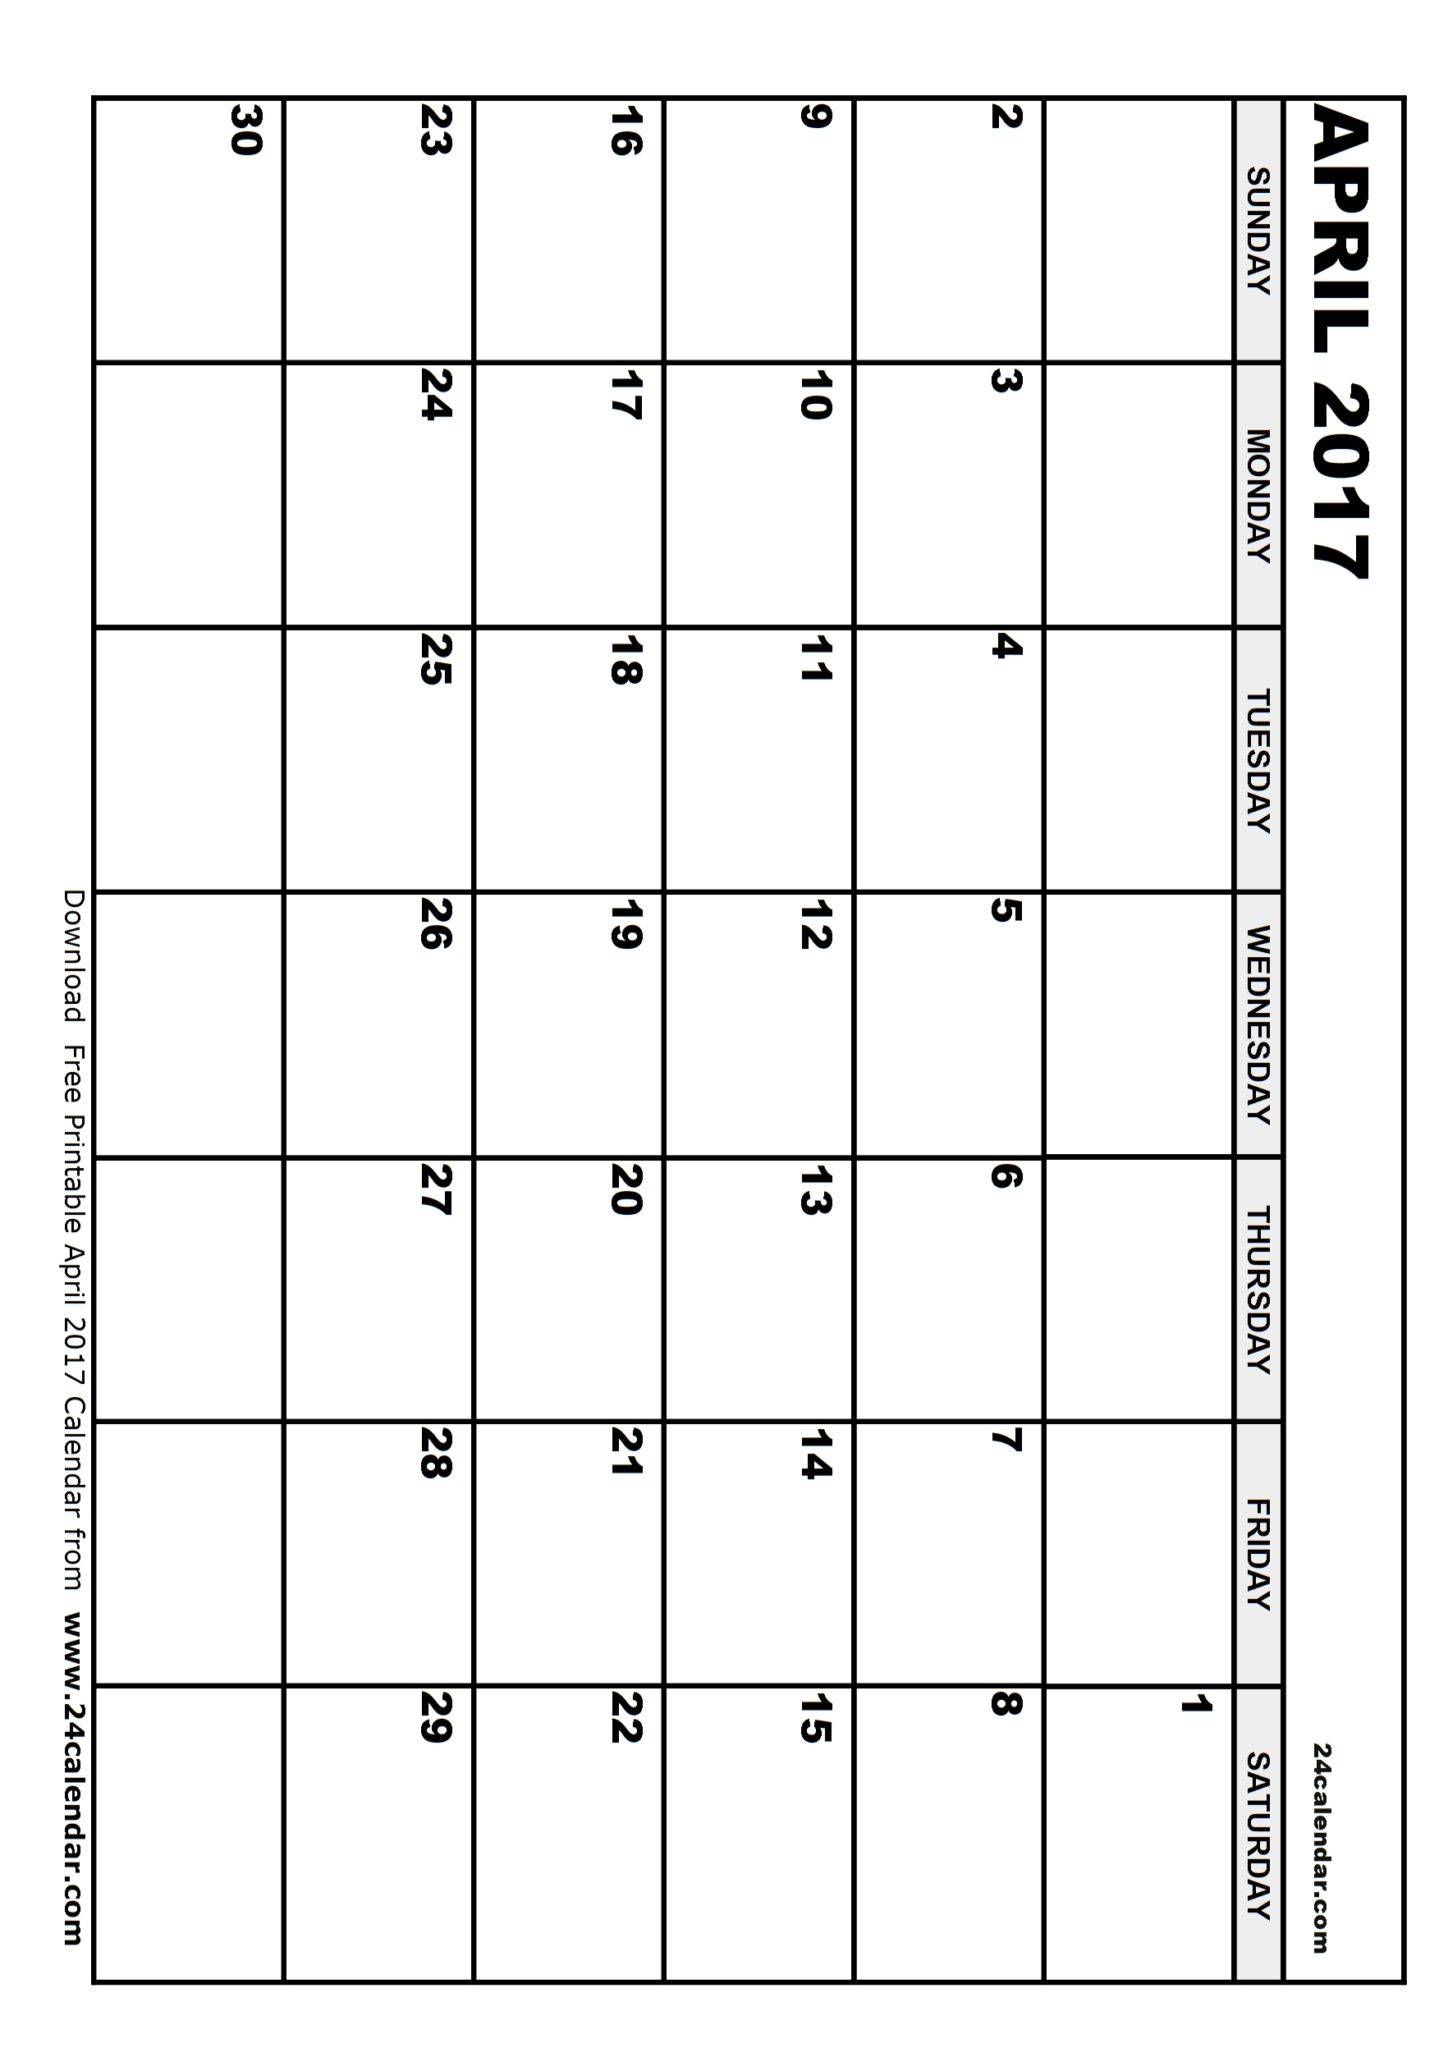 blank april 2017 calendar to print